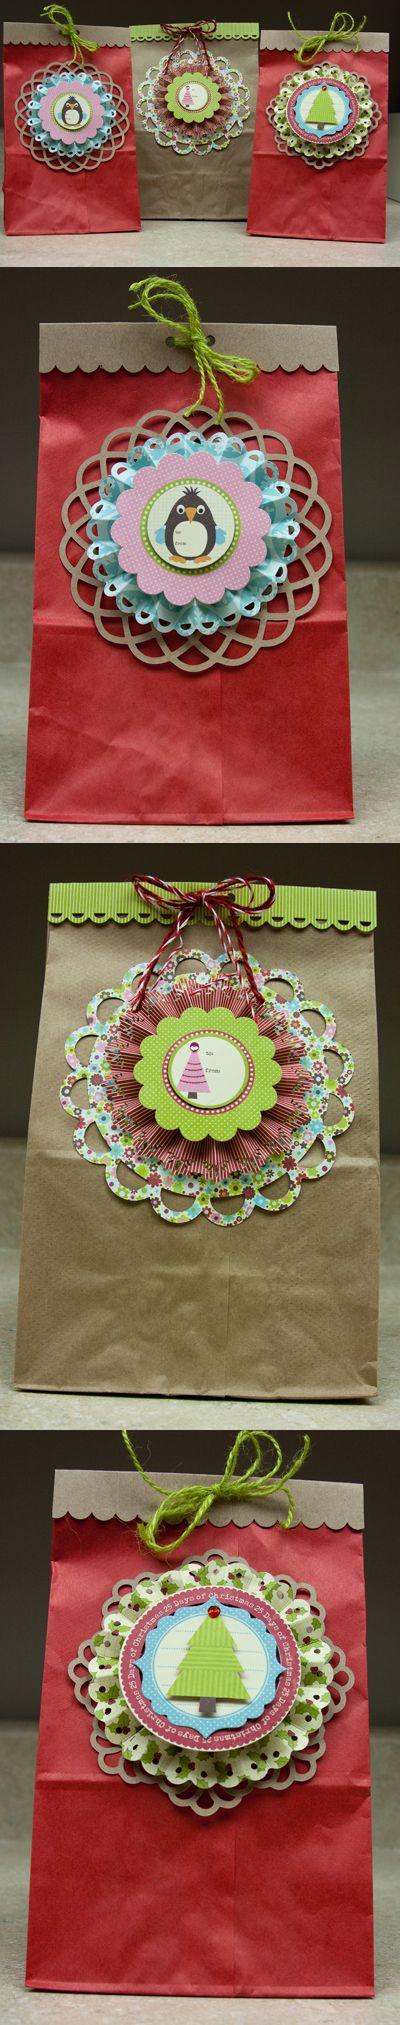 Holiday Treat Bags by Laina Lamb (via Jillibean Soup blog)